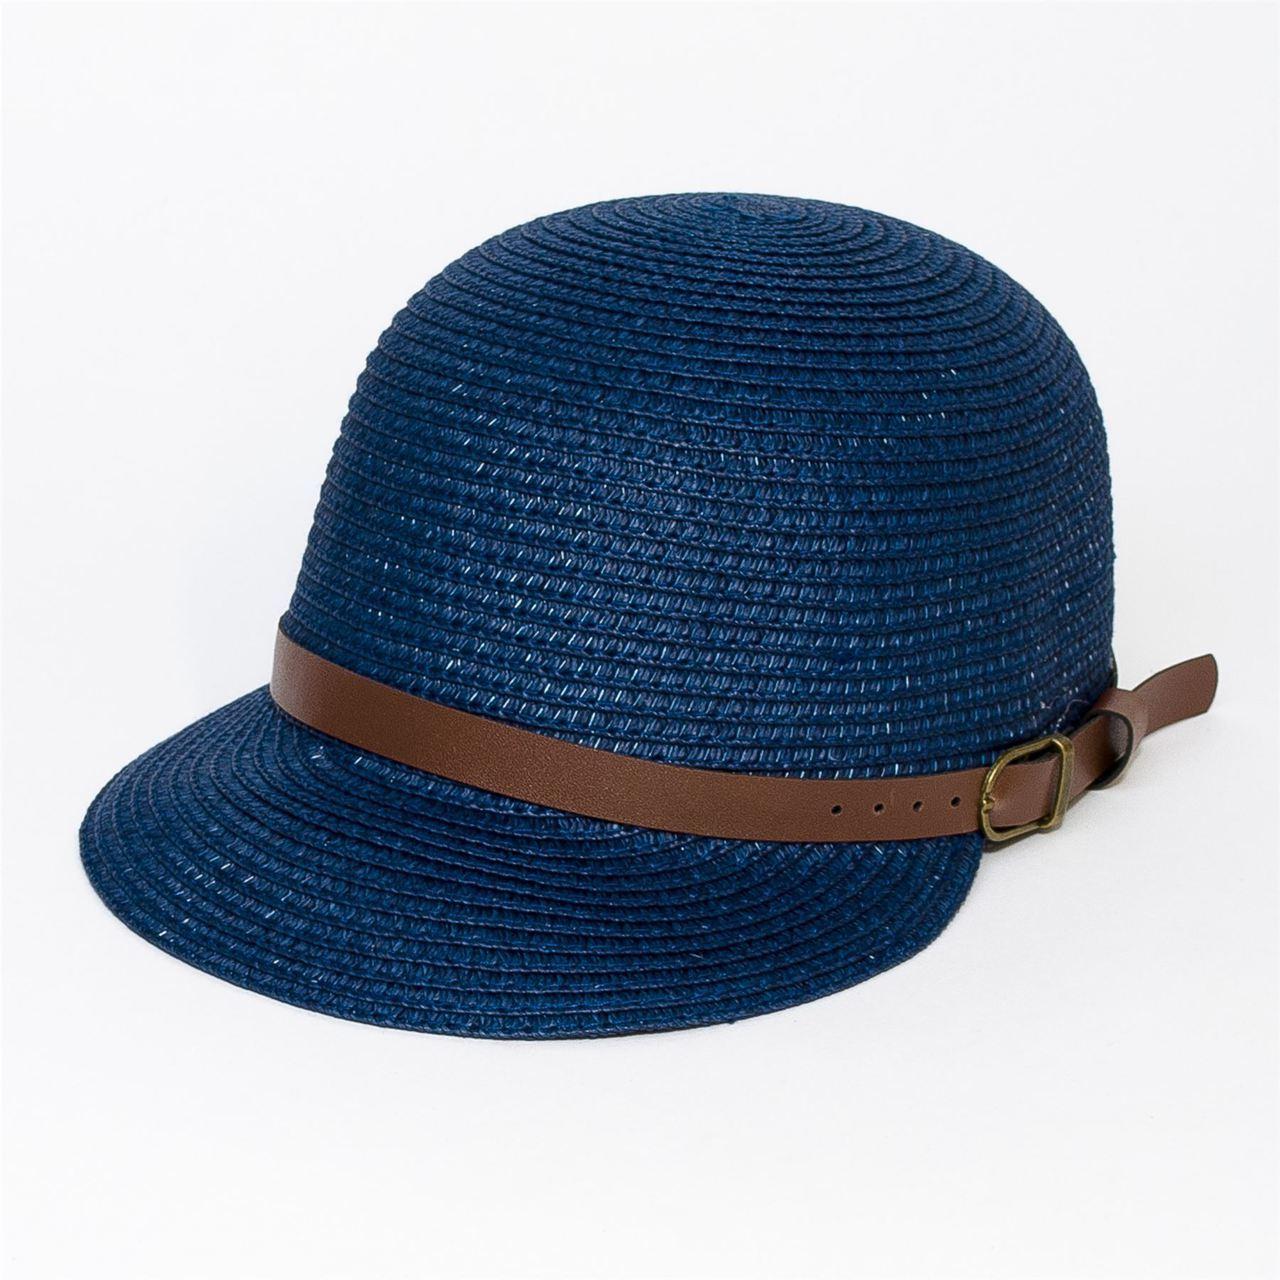 Bekovka slamák s kšiltem barva modrá Assante 161223